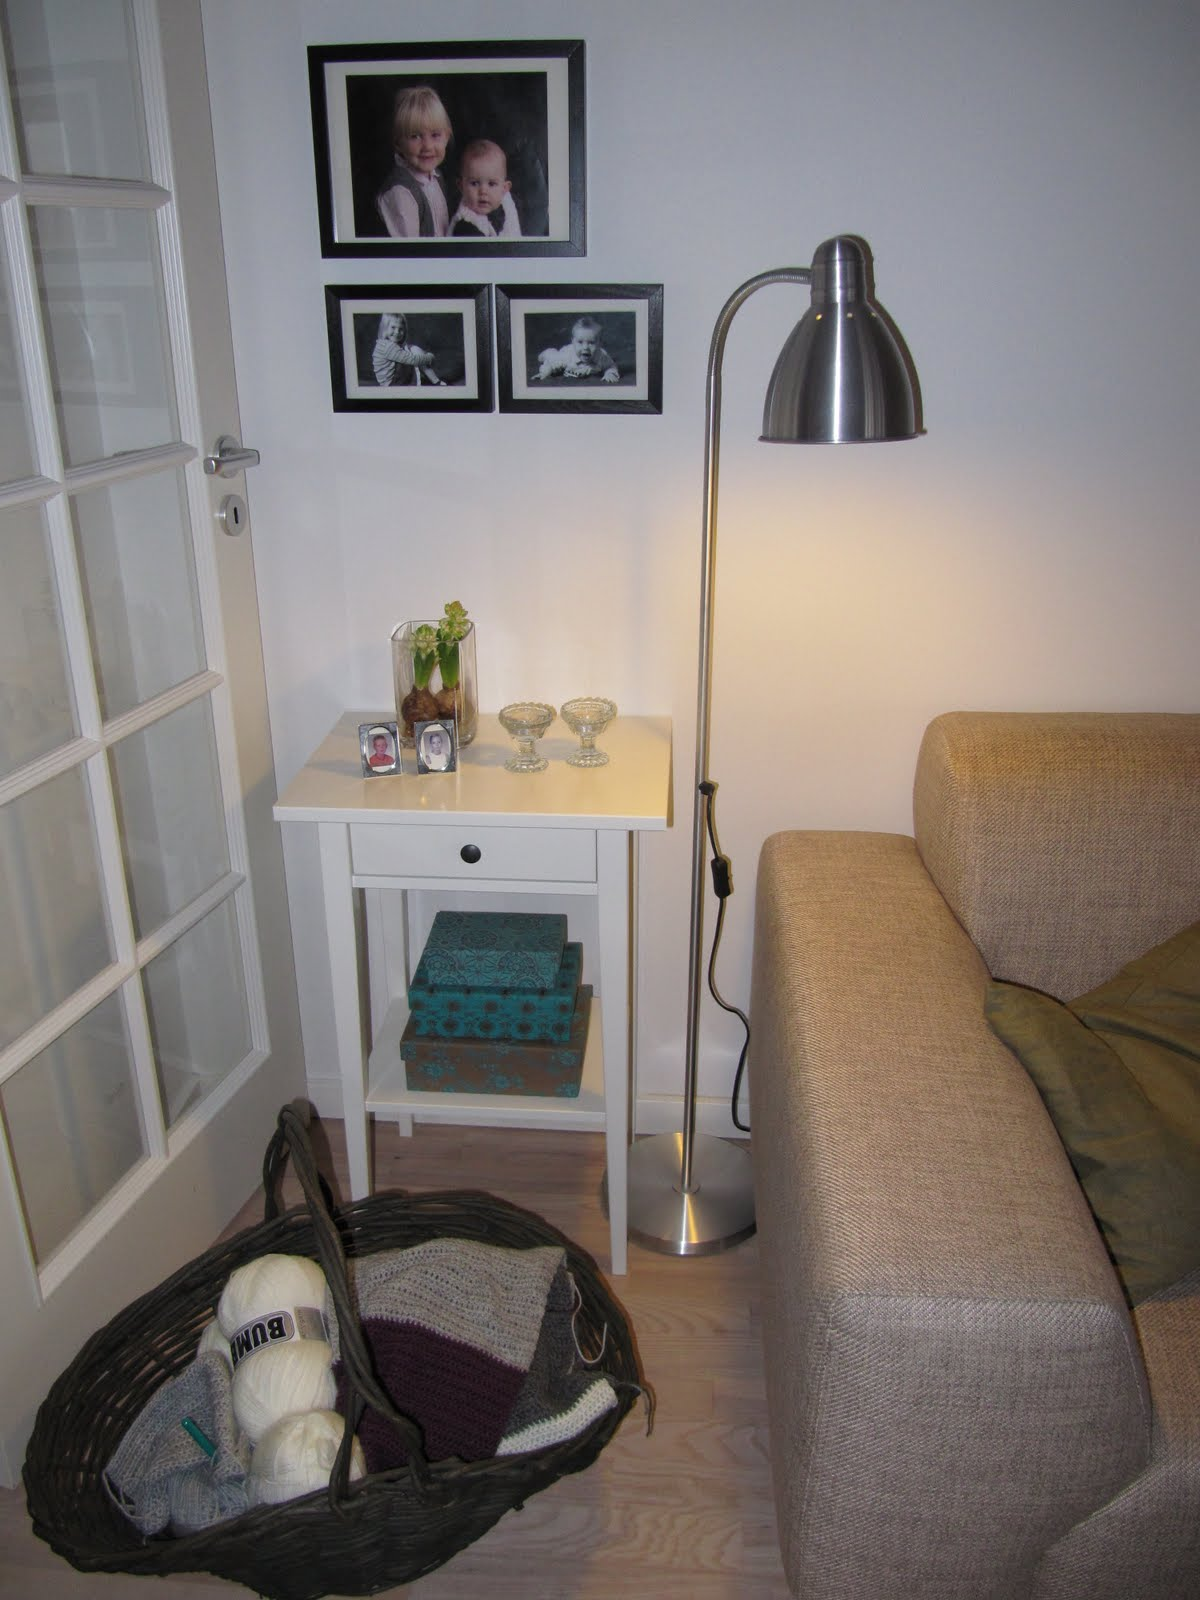 Hjemme hos lene: lidt ny indretning i stuen.